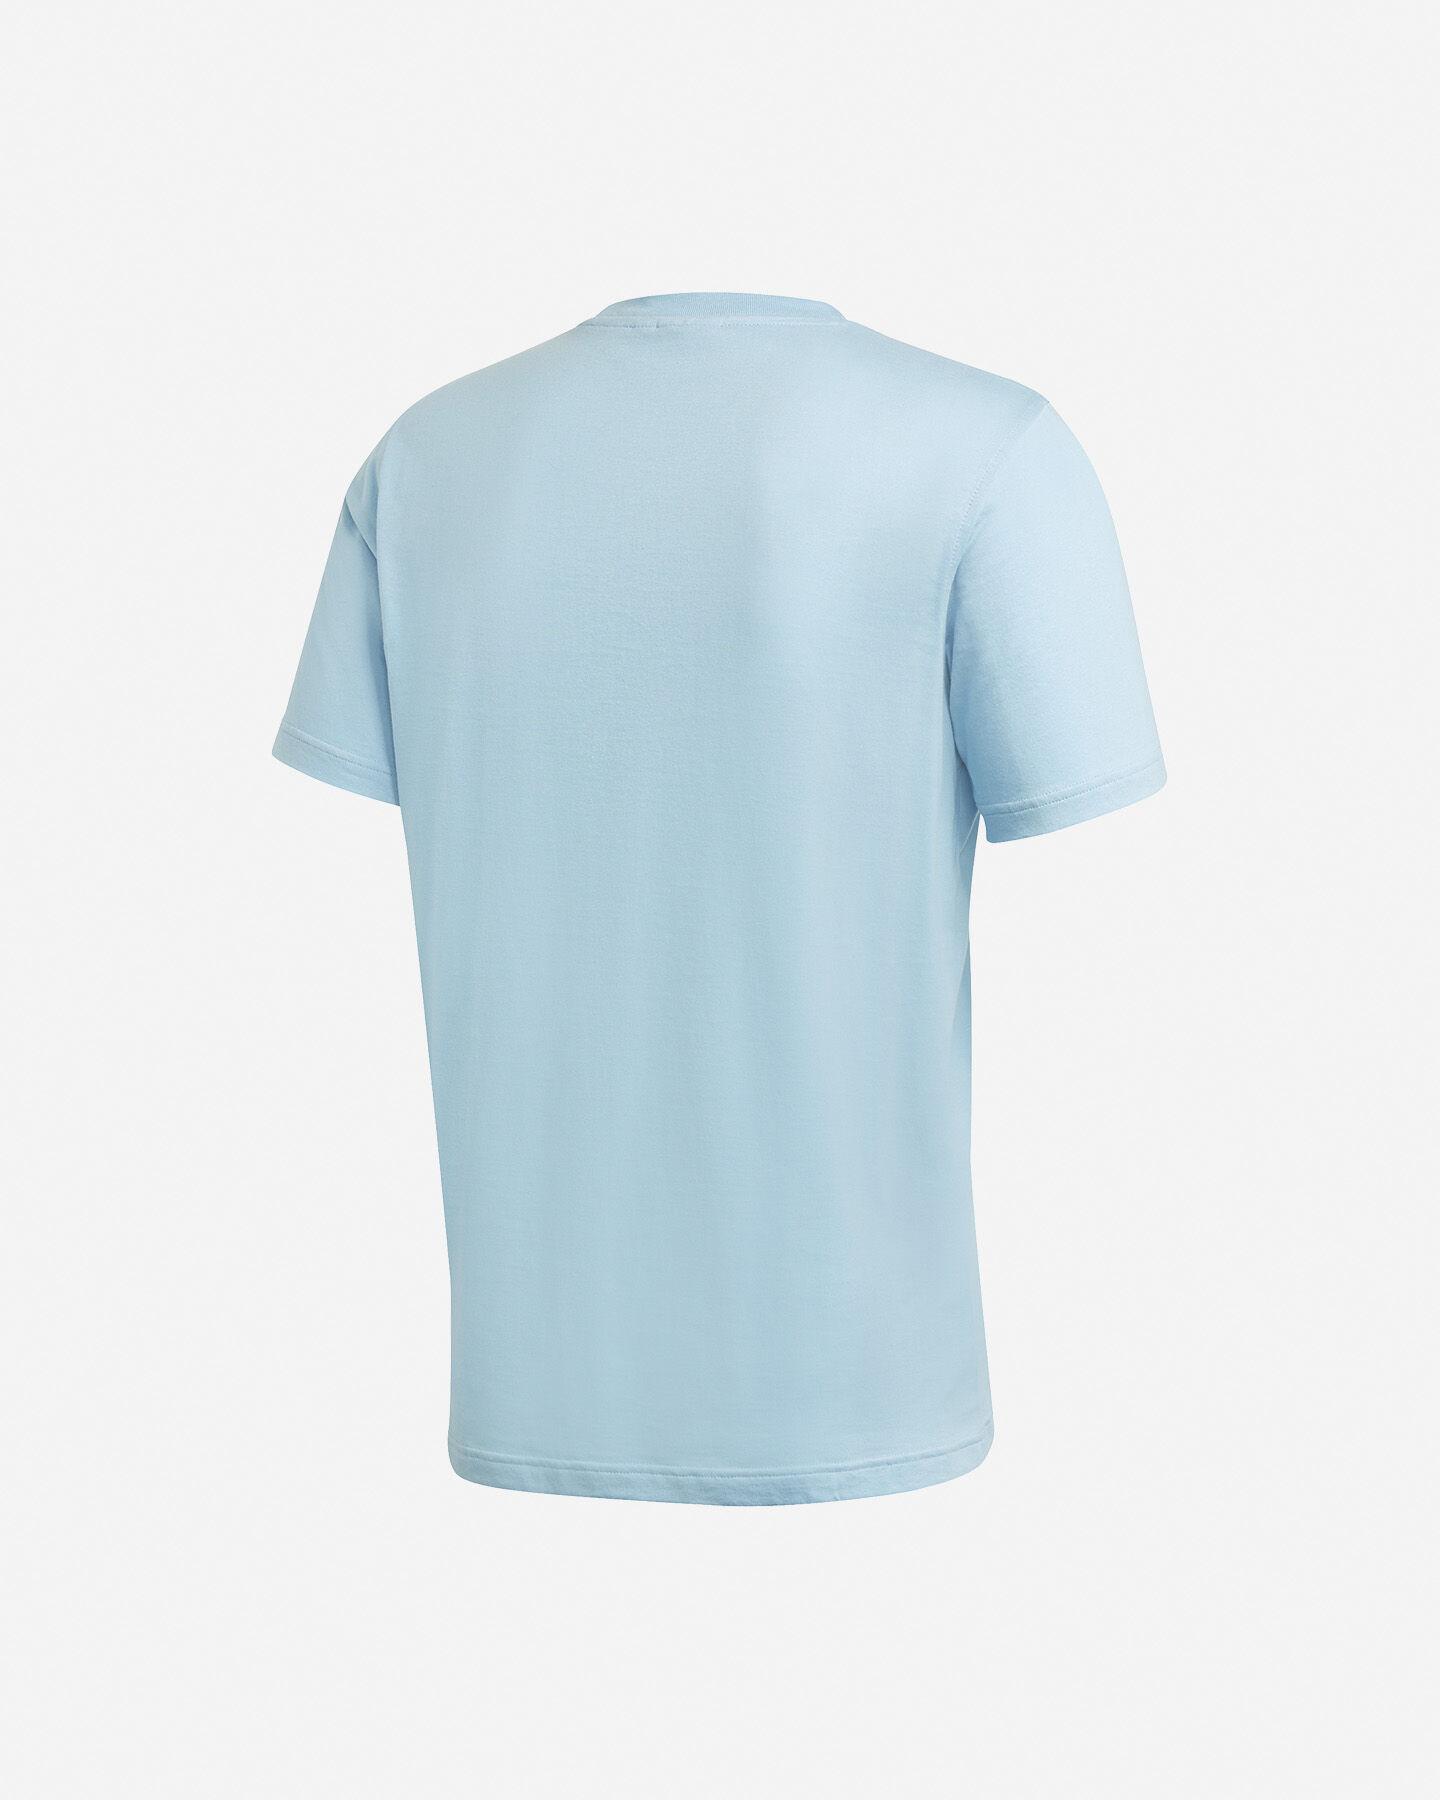 T-Shirt ADIDAS TREFOIL ADICOLOR M S5148483 scatto 1